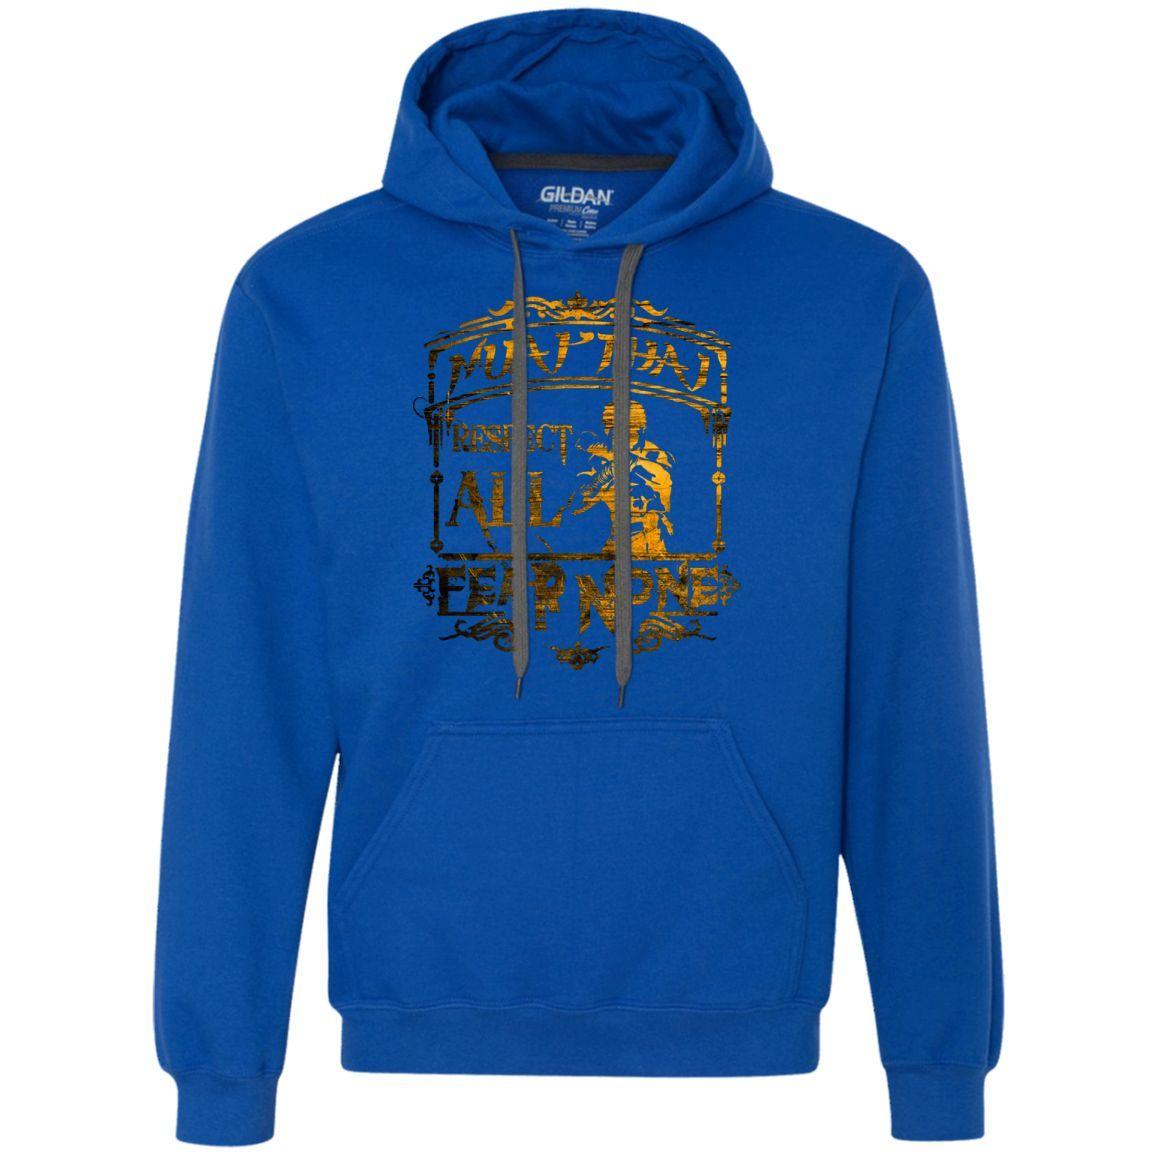 Heavyweight Pullover Fleece Sweatshirt